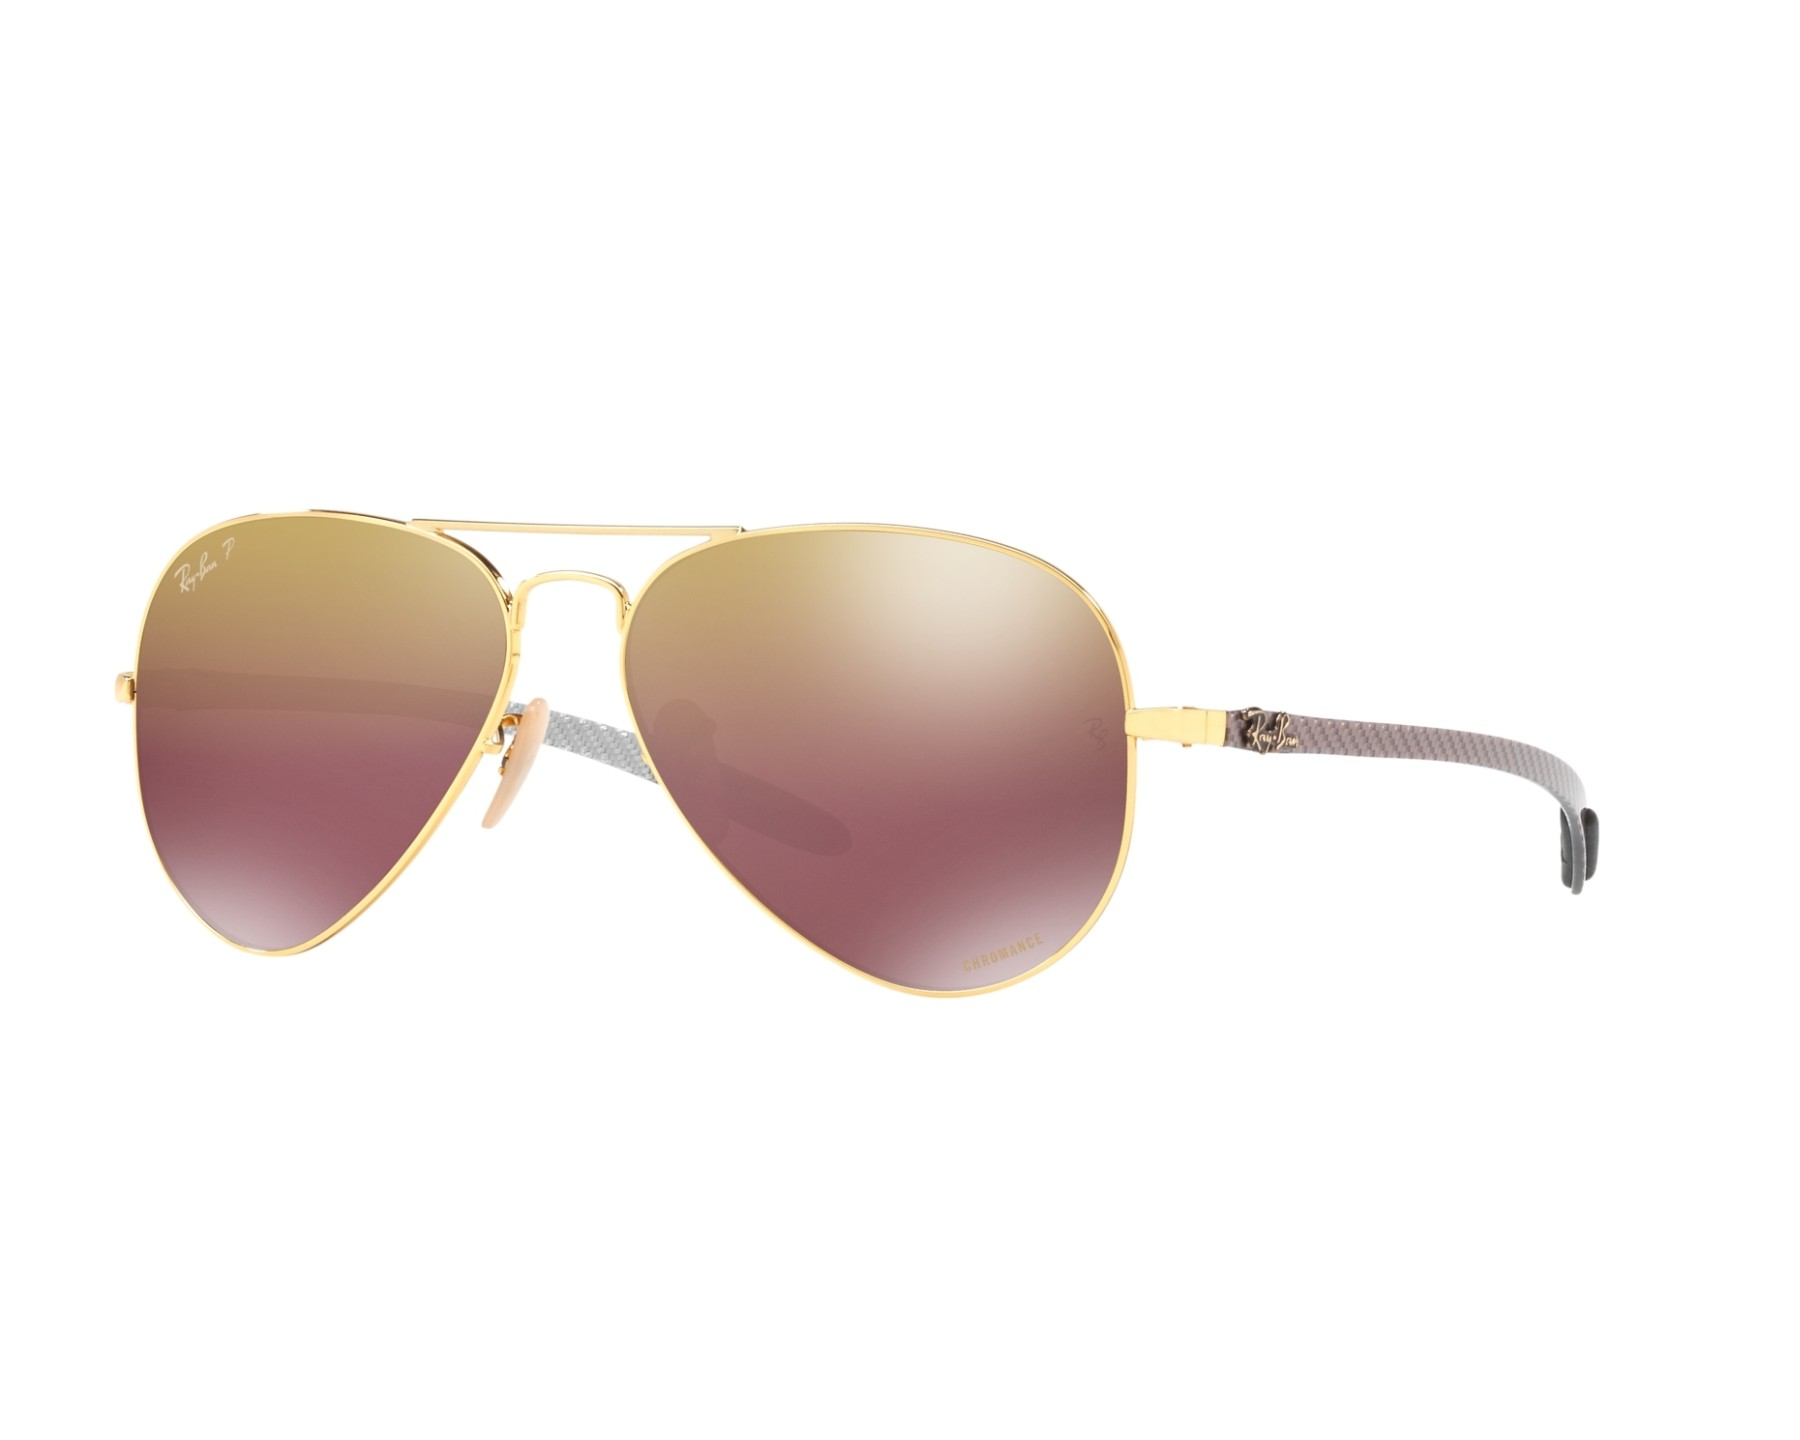 f01effe60c Sunglasses Ray-Ban RB-8317-CH 001 6B 58-14 Gold